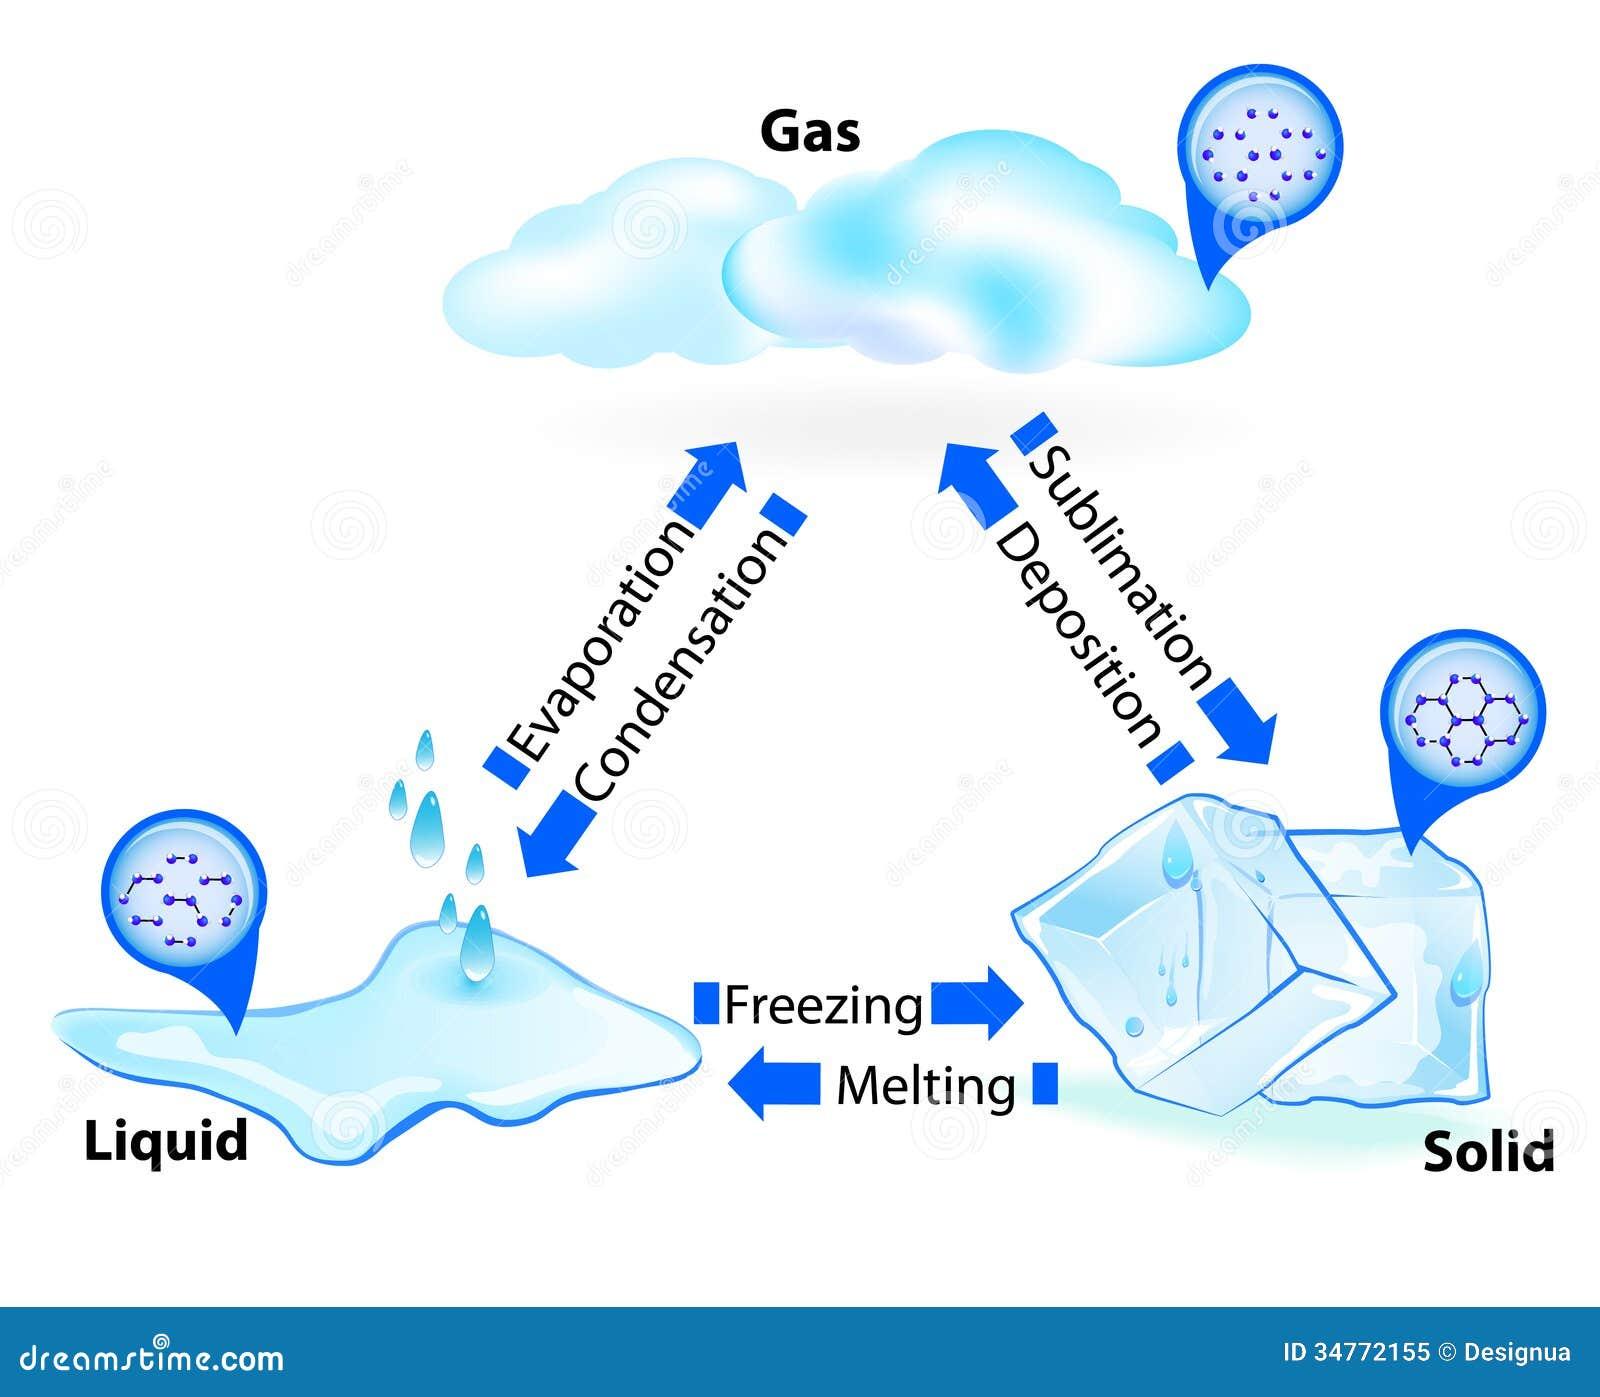 Evaporation Diagram For Kids Evaporation diagram for kids